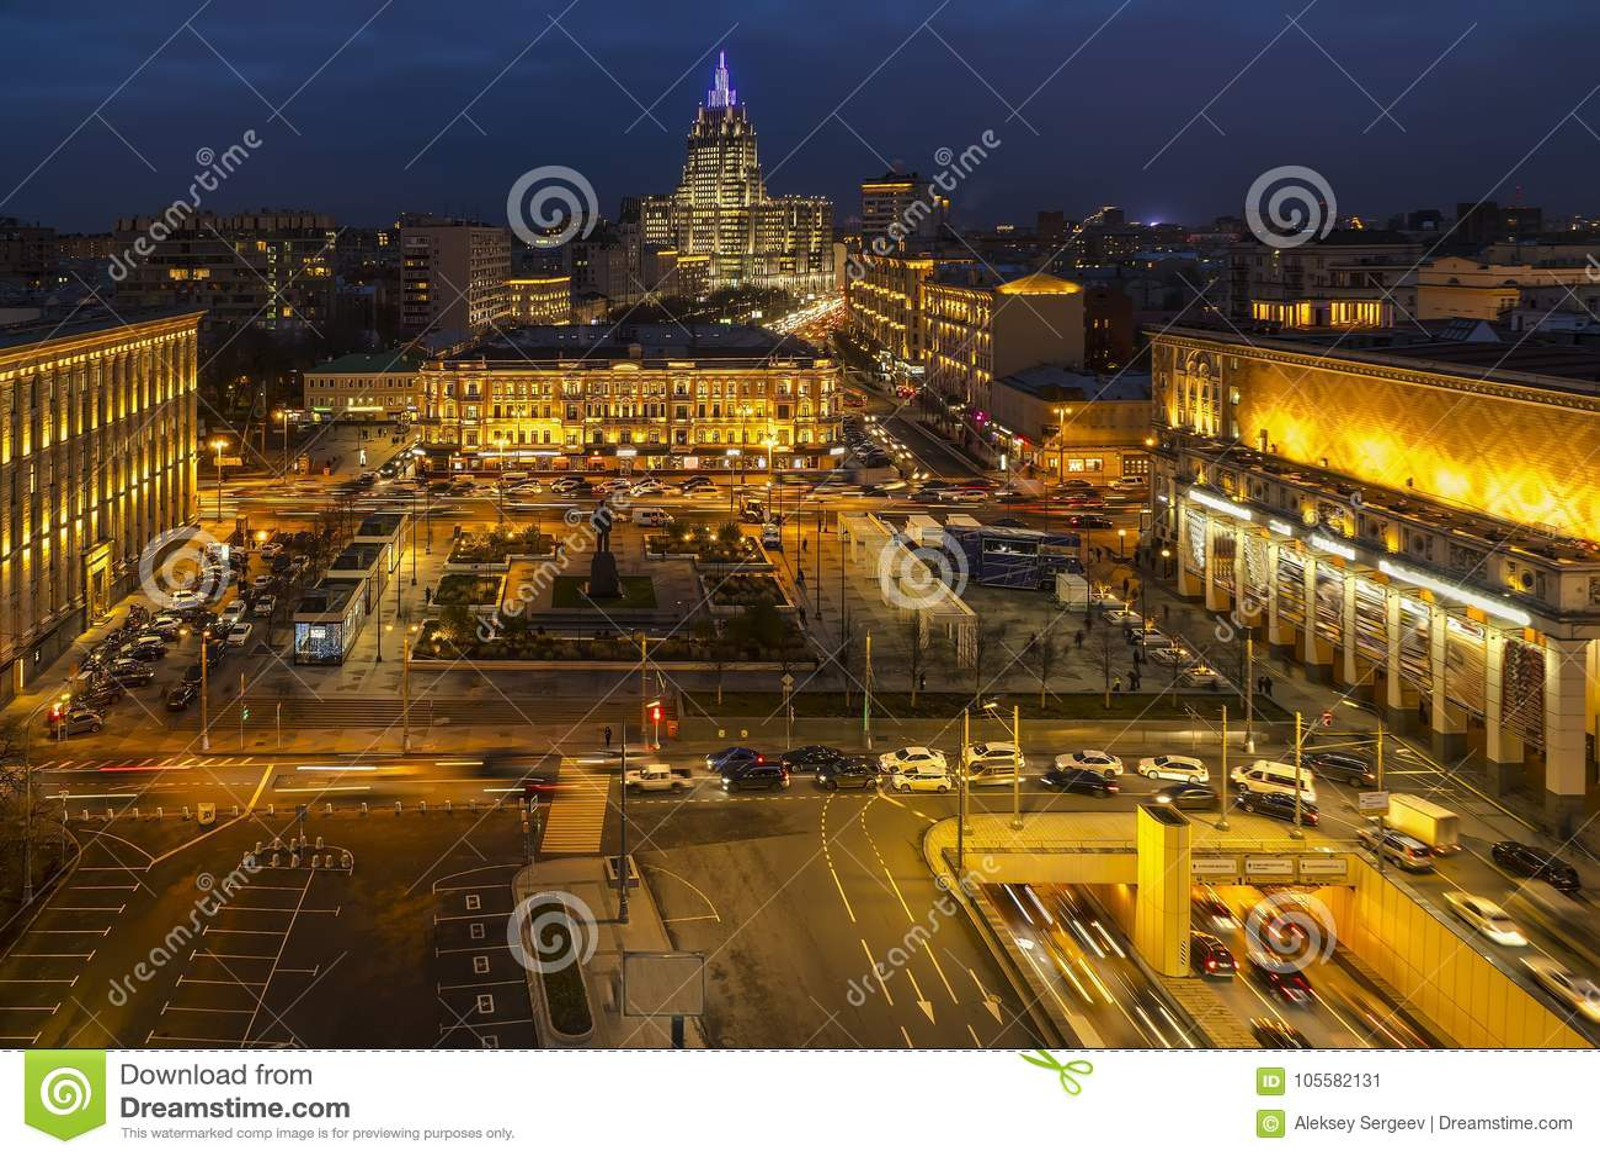 Urban roofs, horizon line and night traffic